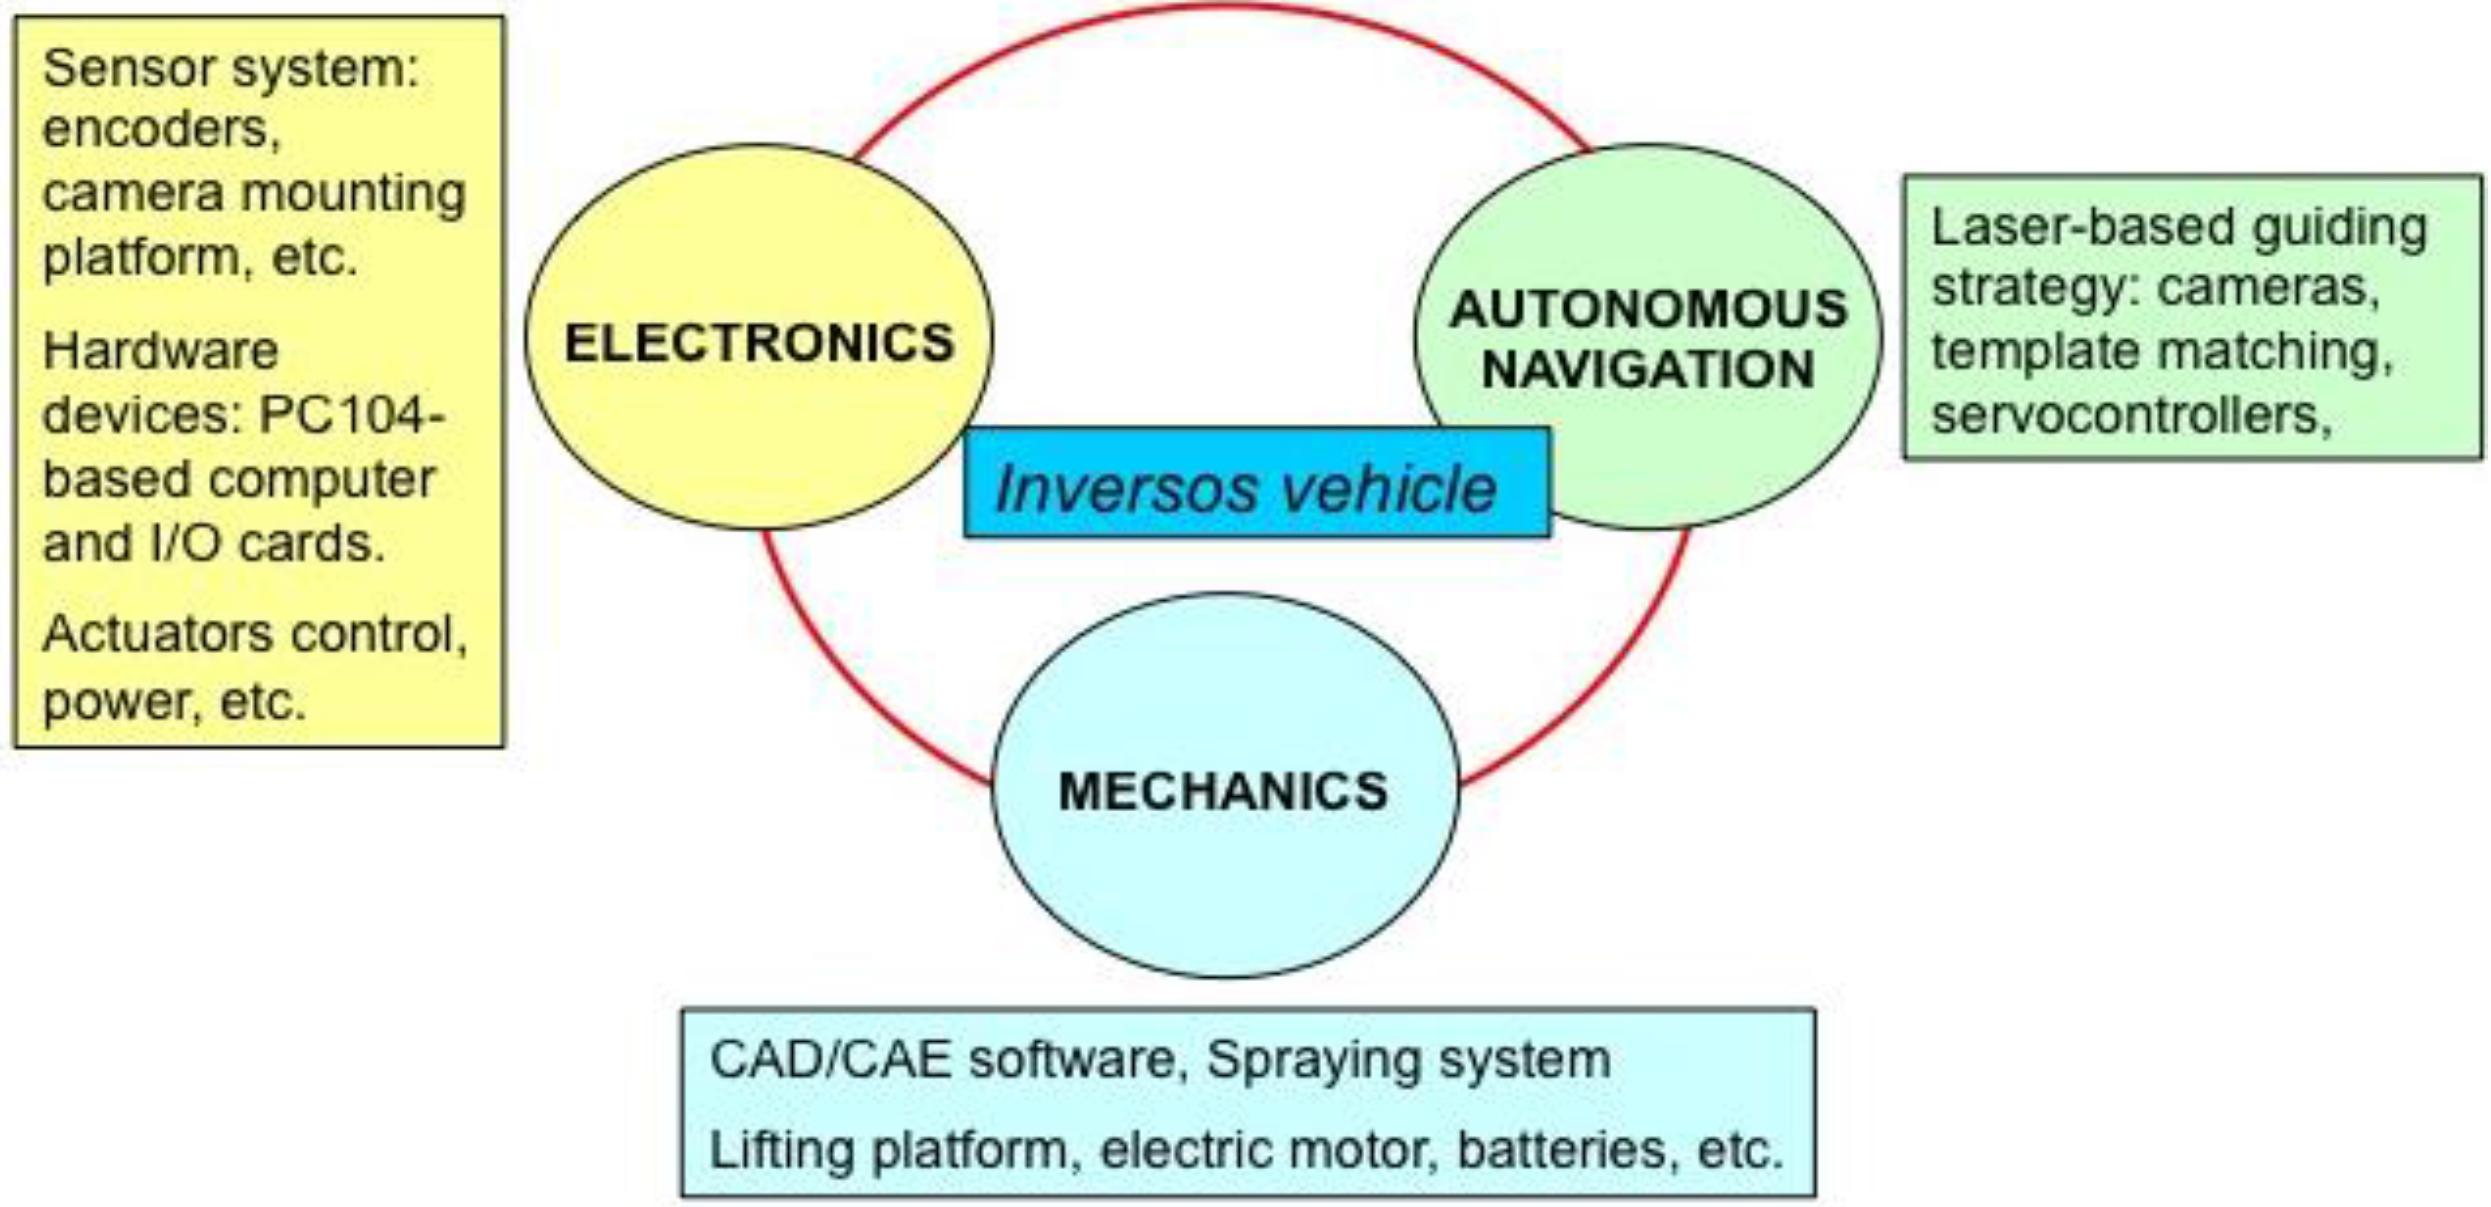 Sensors | Free Full-Text | Mechatronic Description of a Laser ...